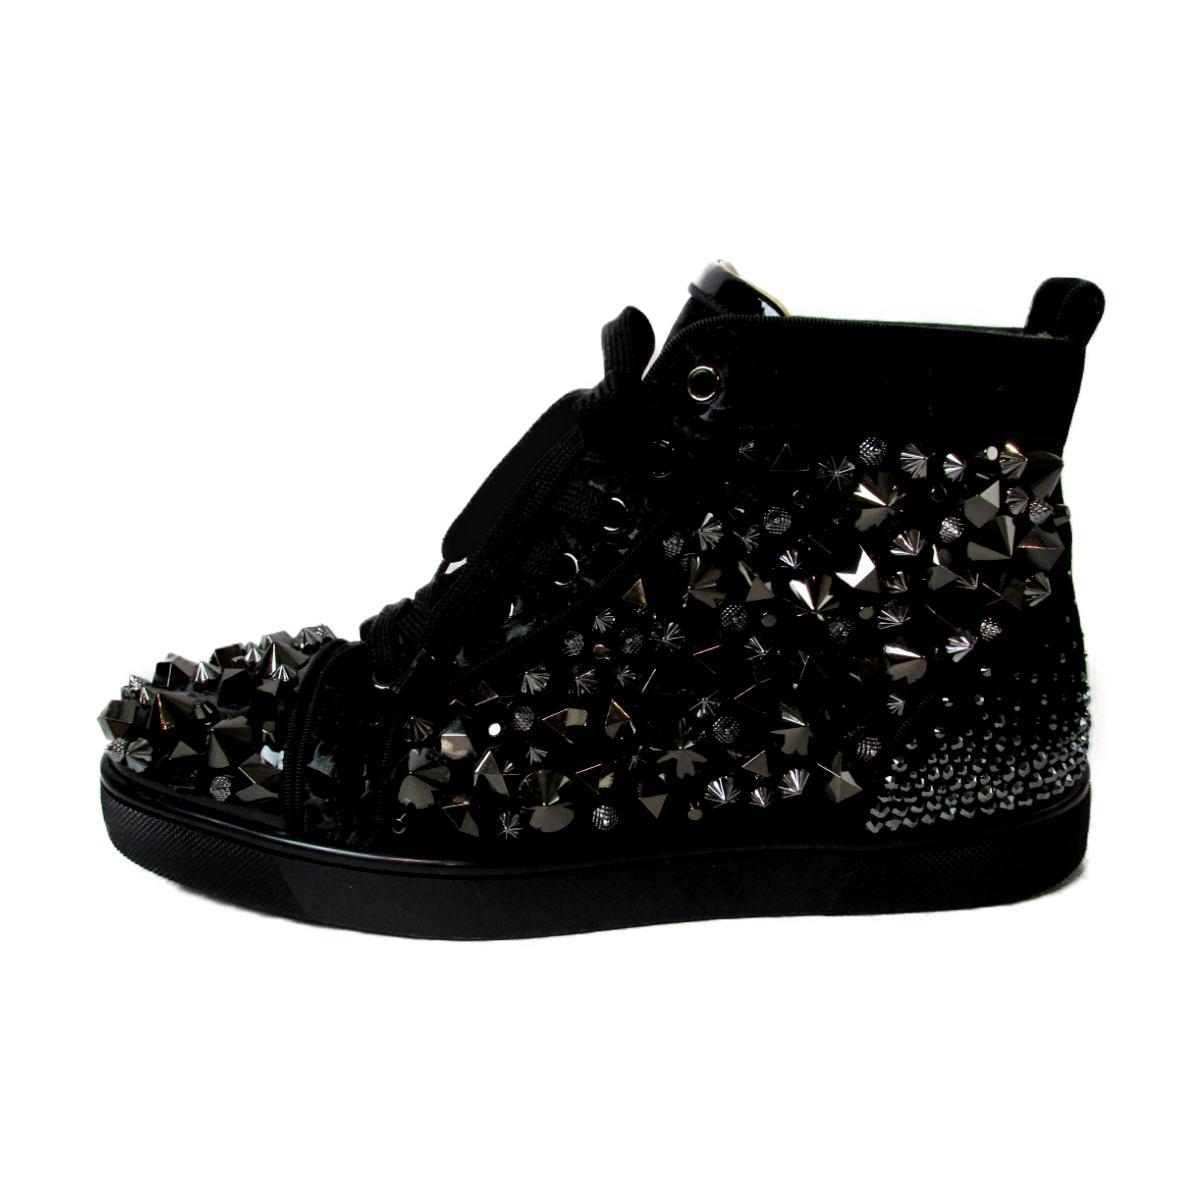 watch 3e4f0 c3b36 Christian ルブタンハイカット sneakers men gap Dis suede X patent velour studs  spangles bijou black | Christian louboutin BRANDOFF brand ...